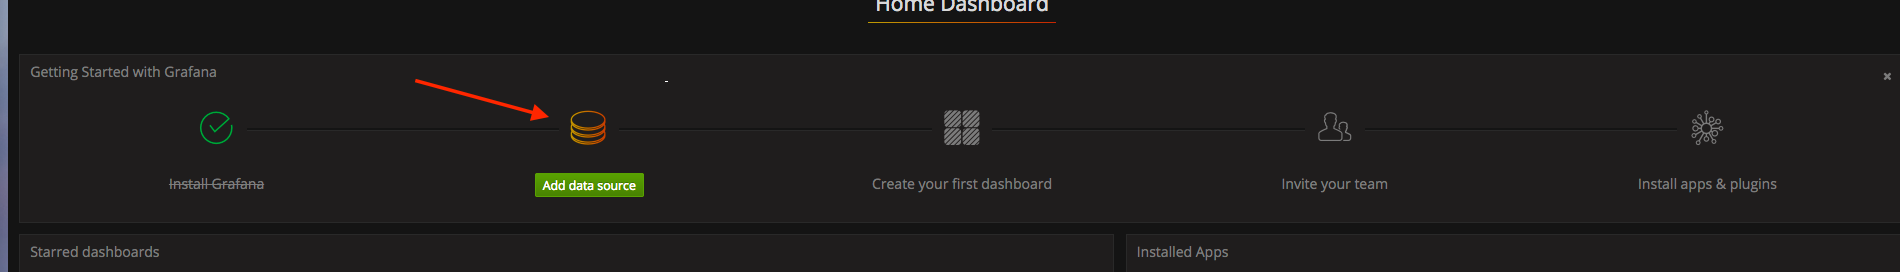 Step 1: Add Data Source